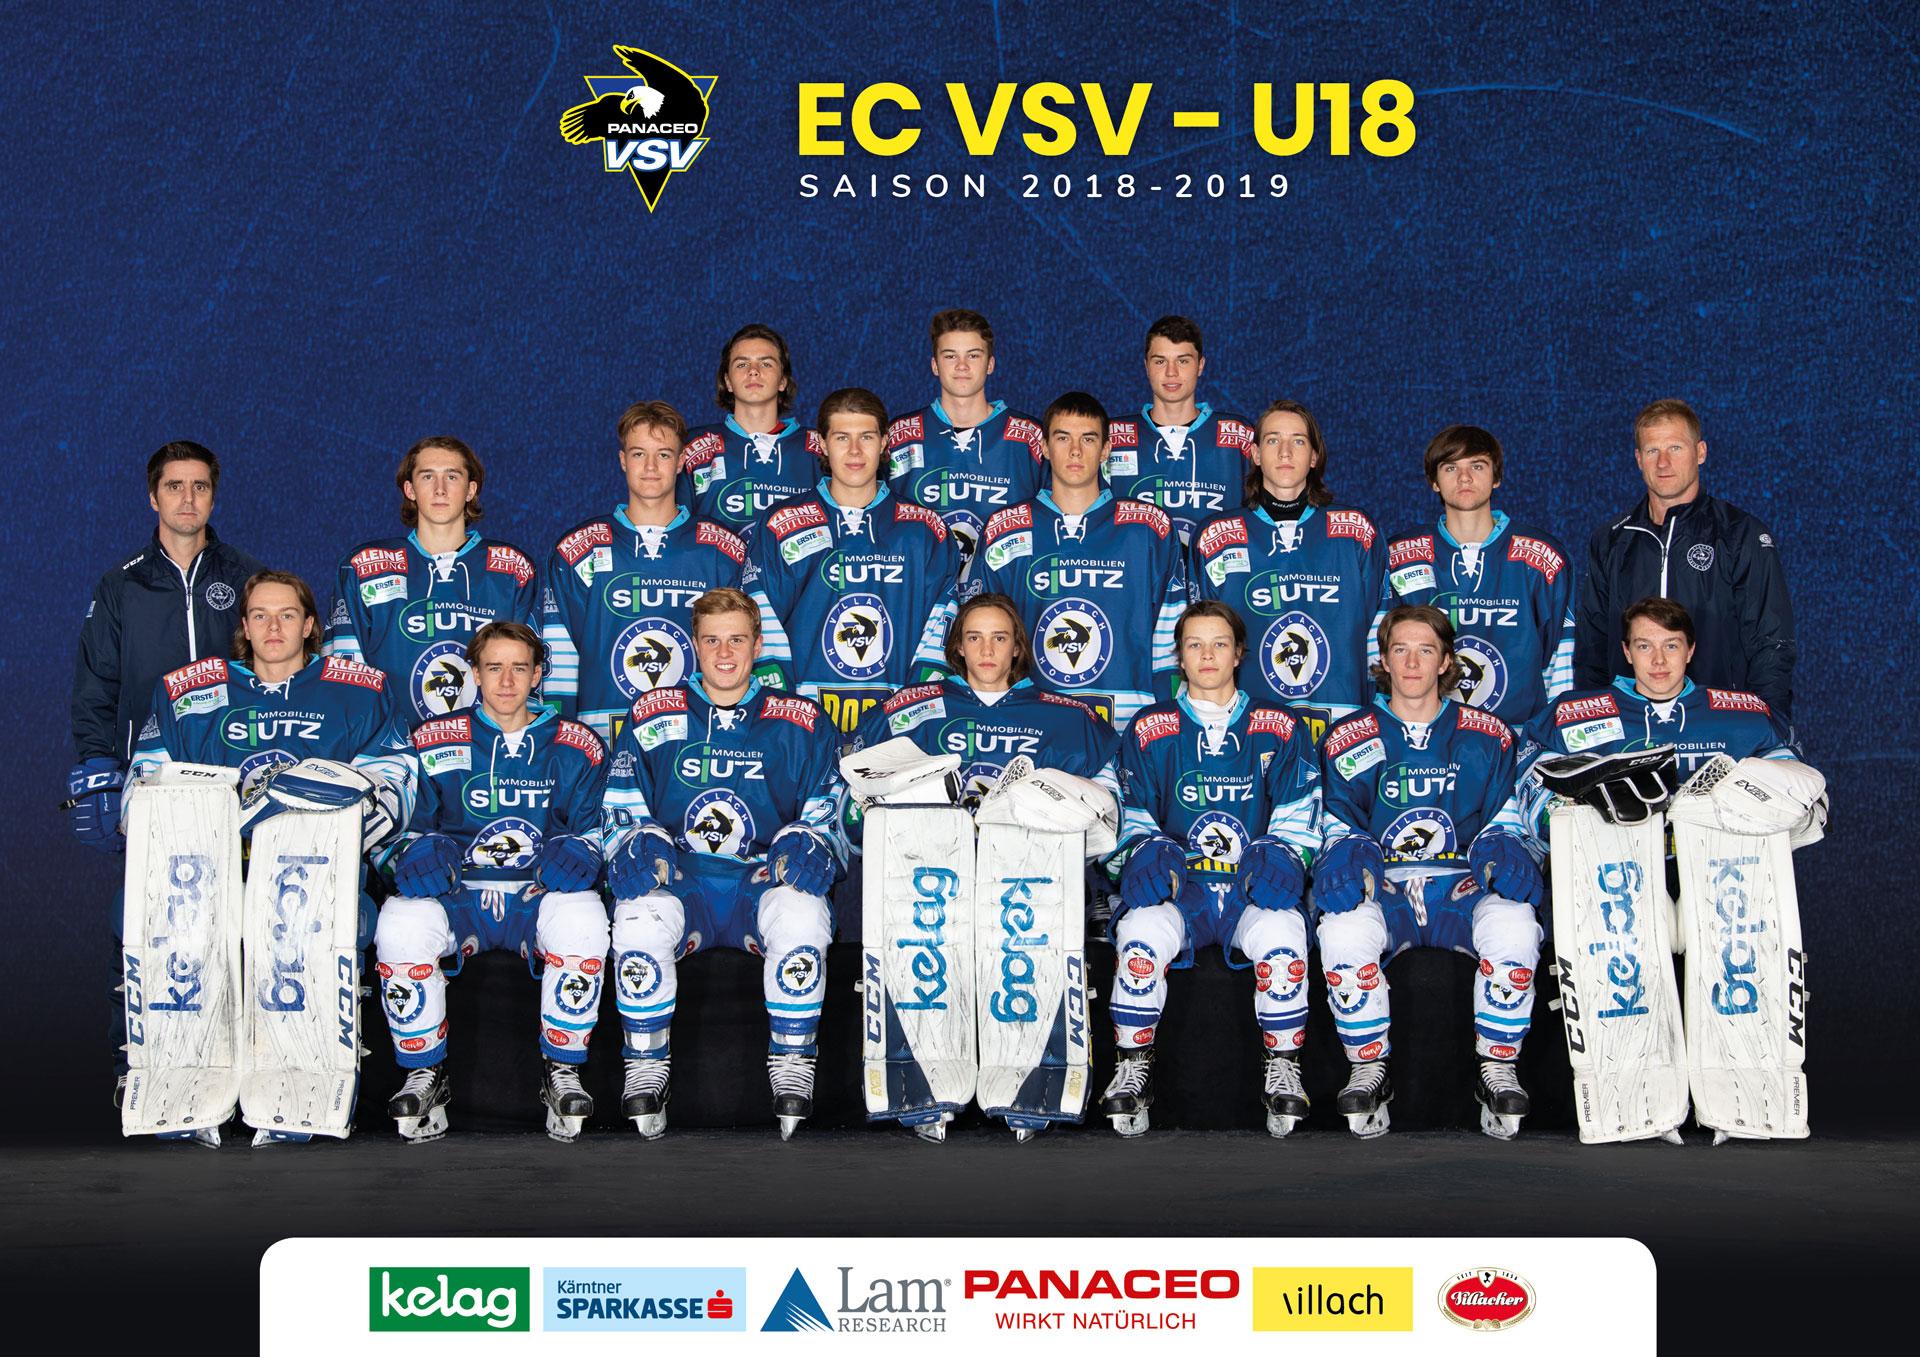 EC PANACEO VSV U18 2018-19